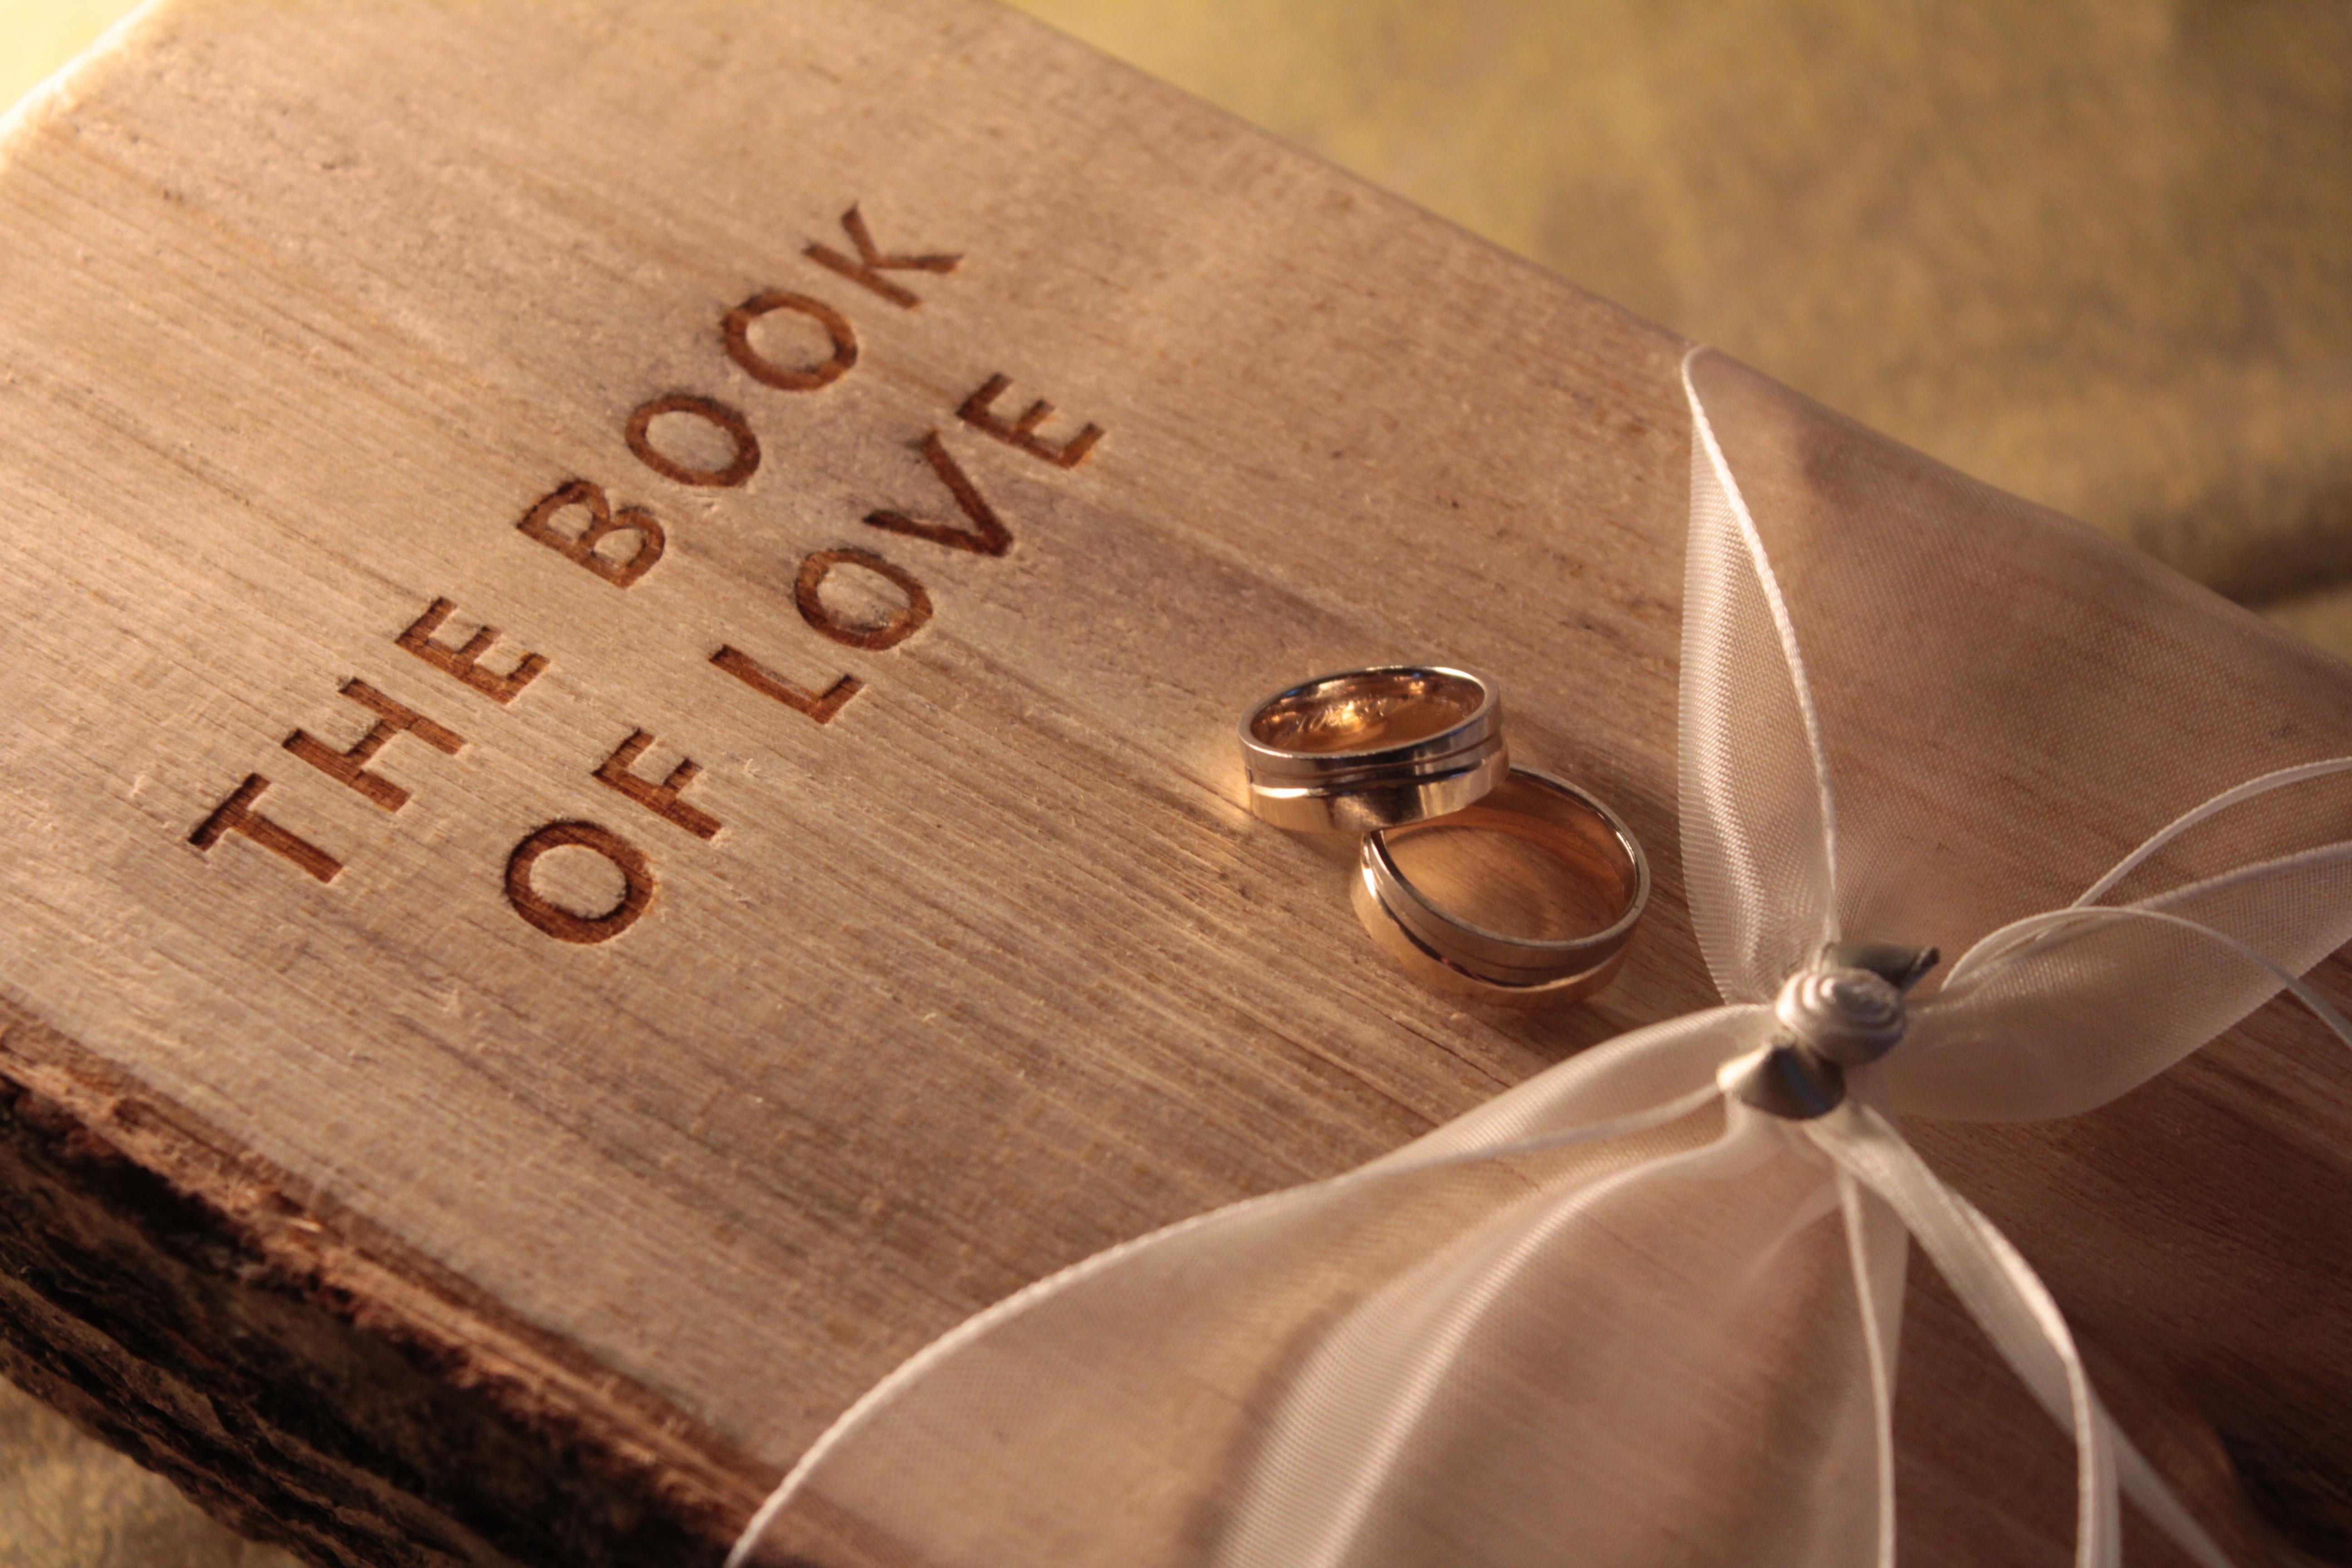 Bordon design agentur zeitvertreib for Love the love